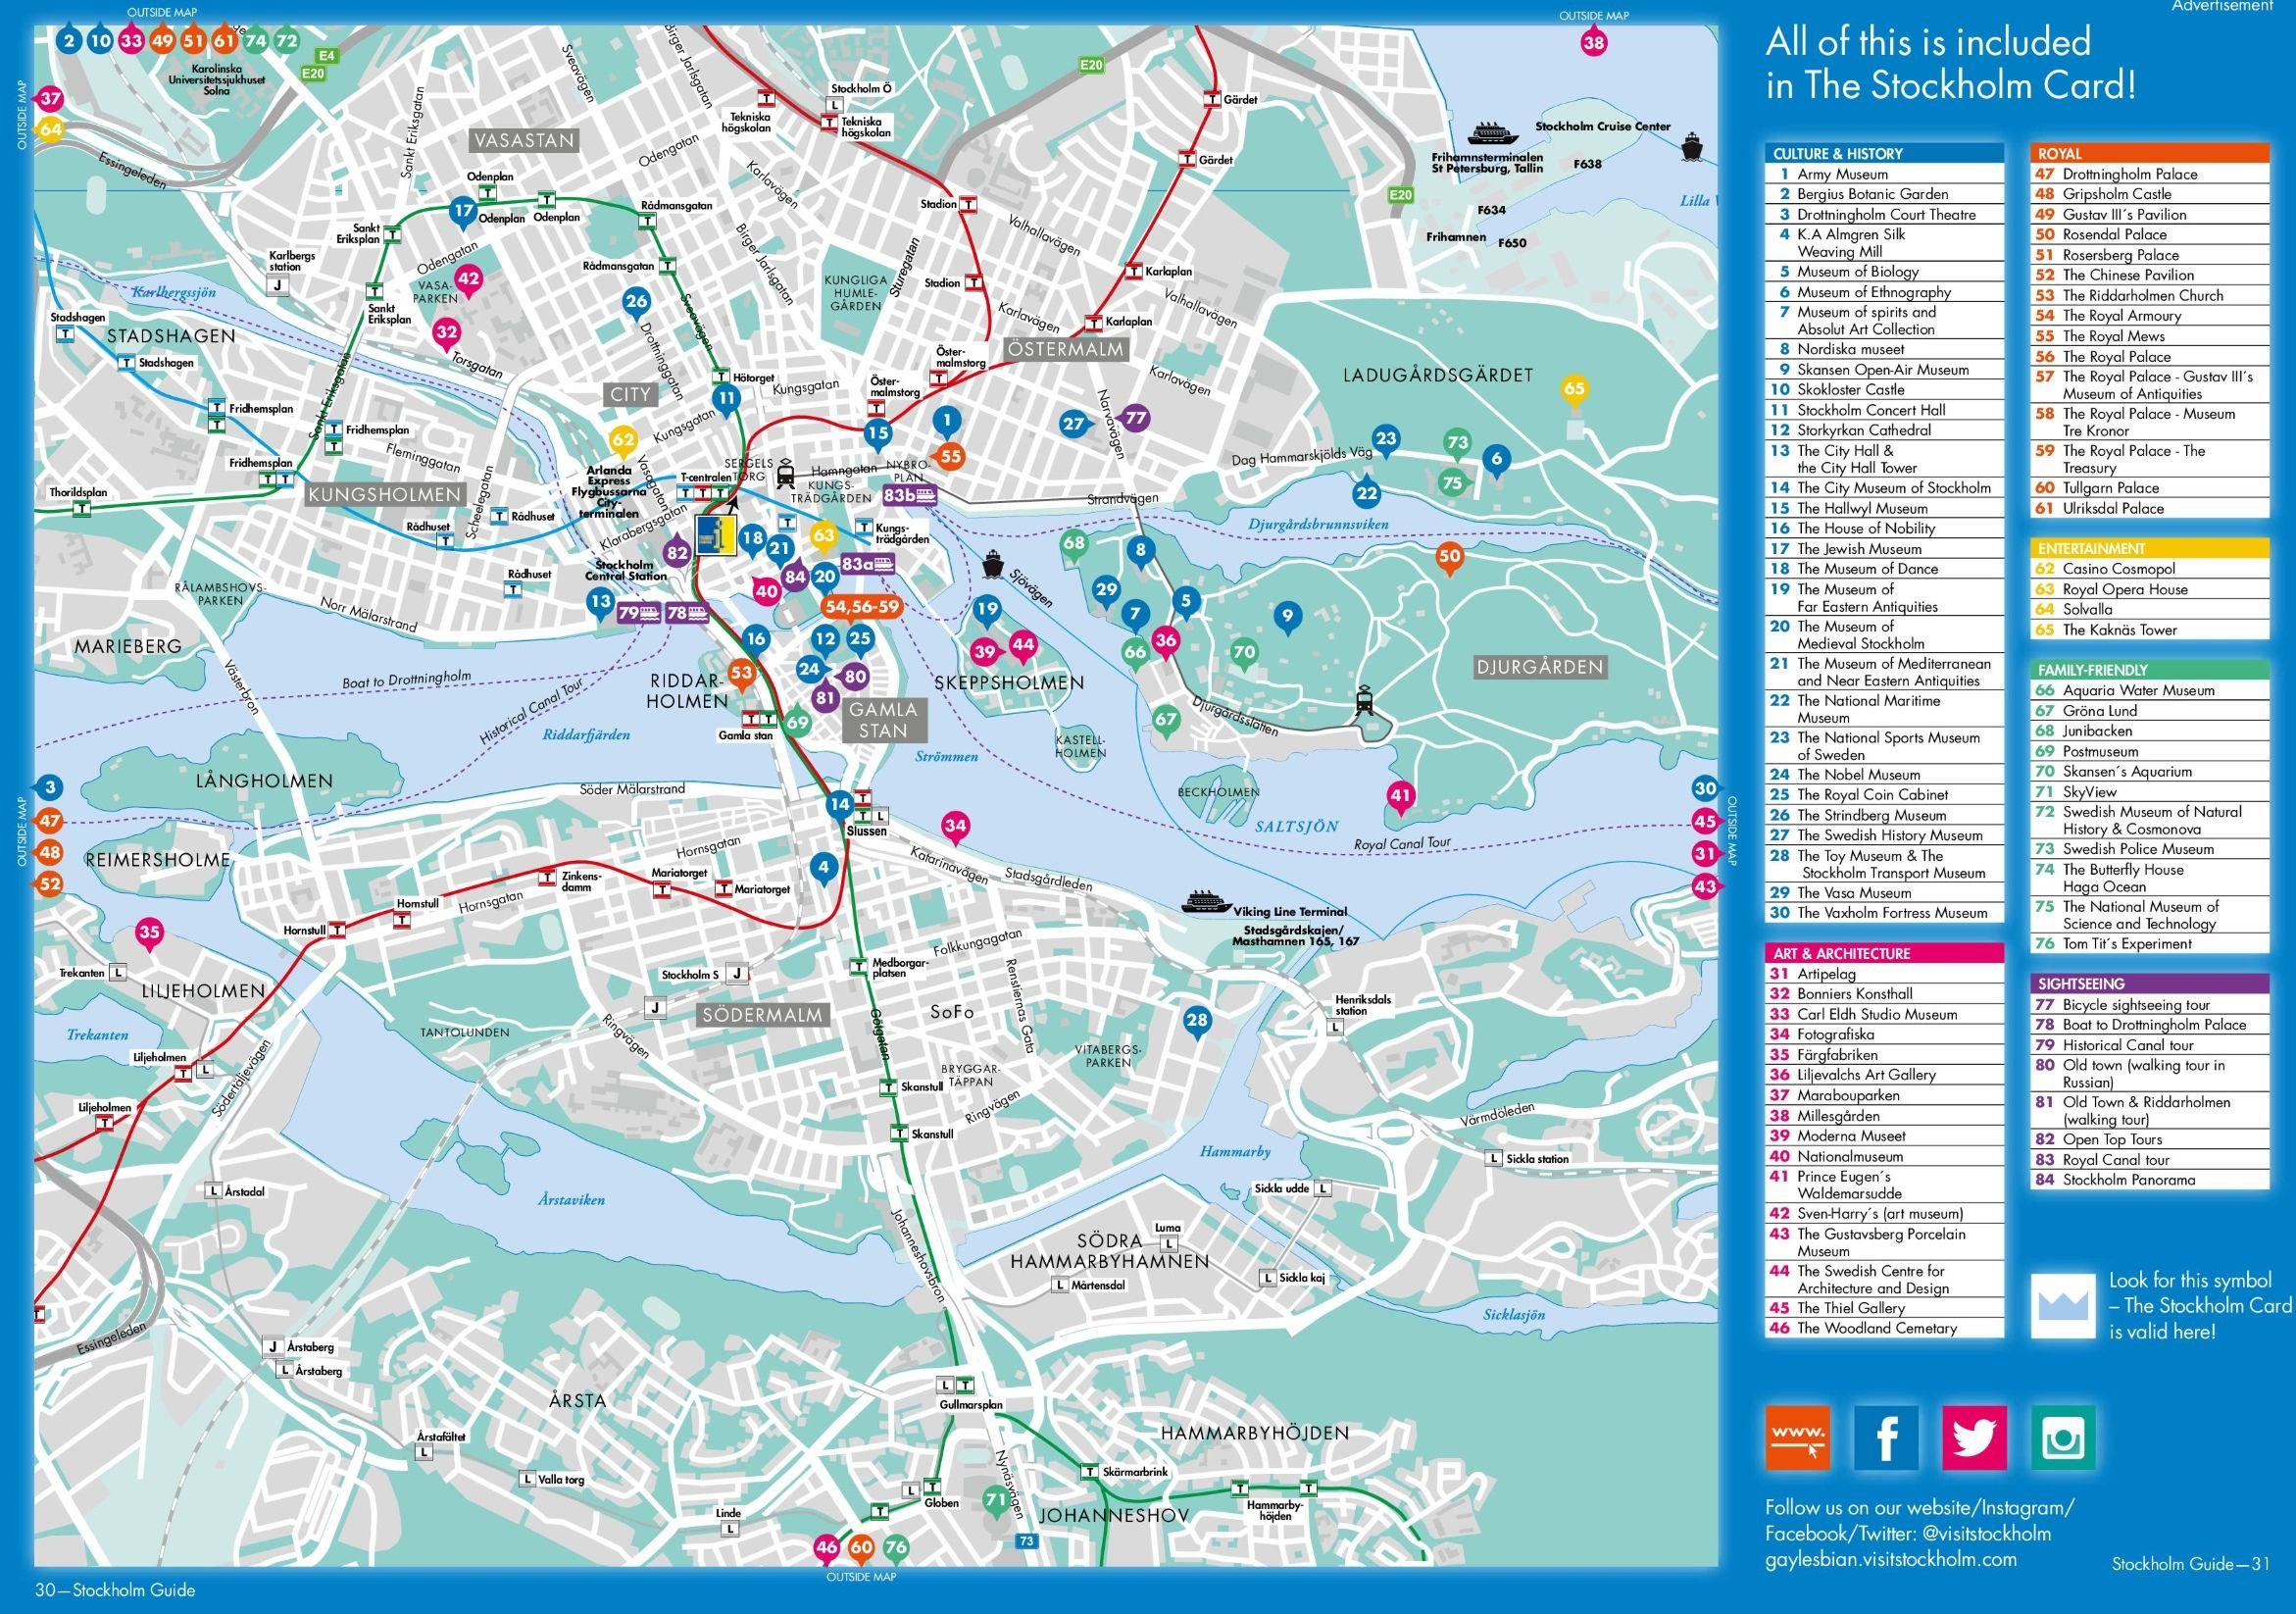 Stockholm tourist attractions map Stockholm Pinterest